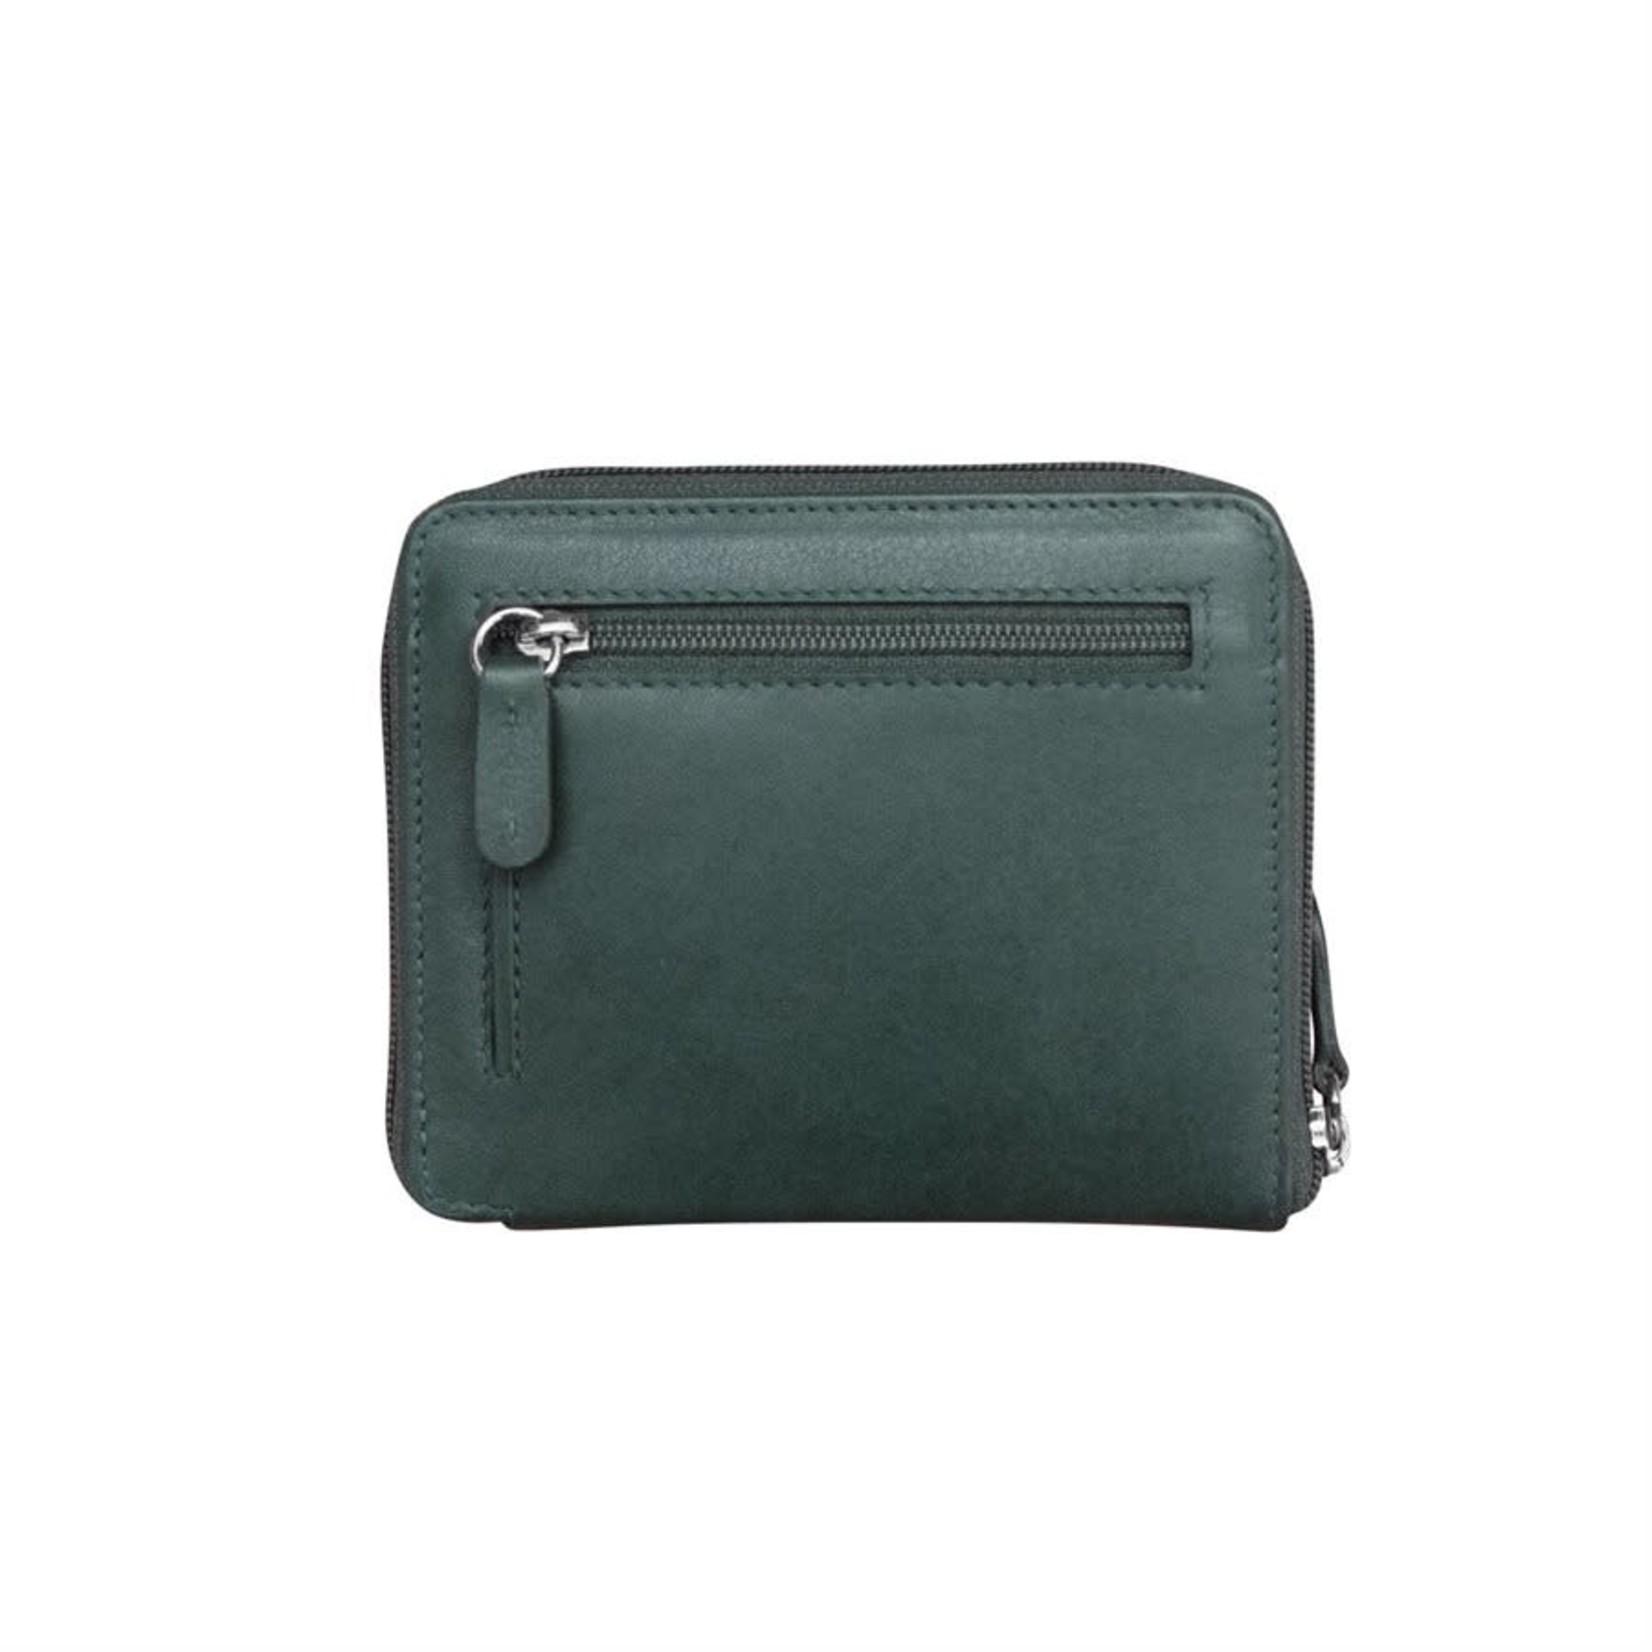 Leather Handbags and Accessories 7859 Indigo - RFID Zip Around Wallet